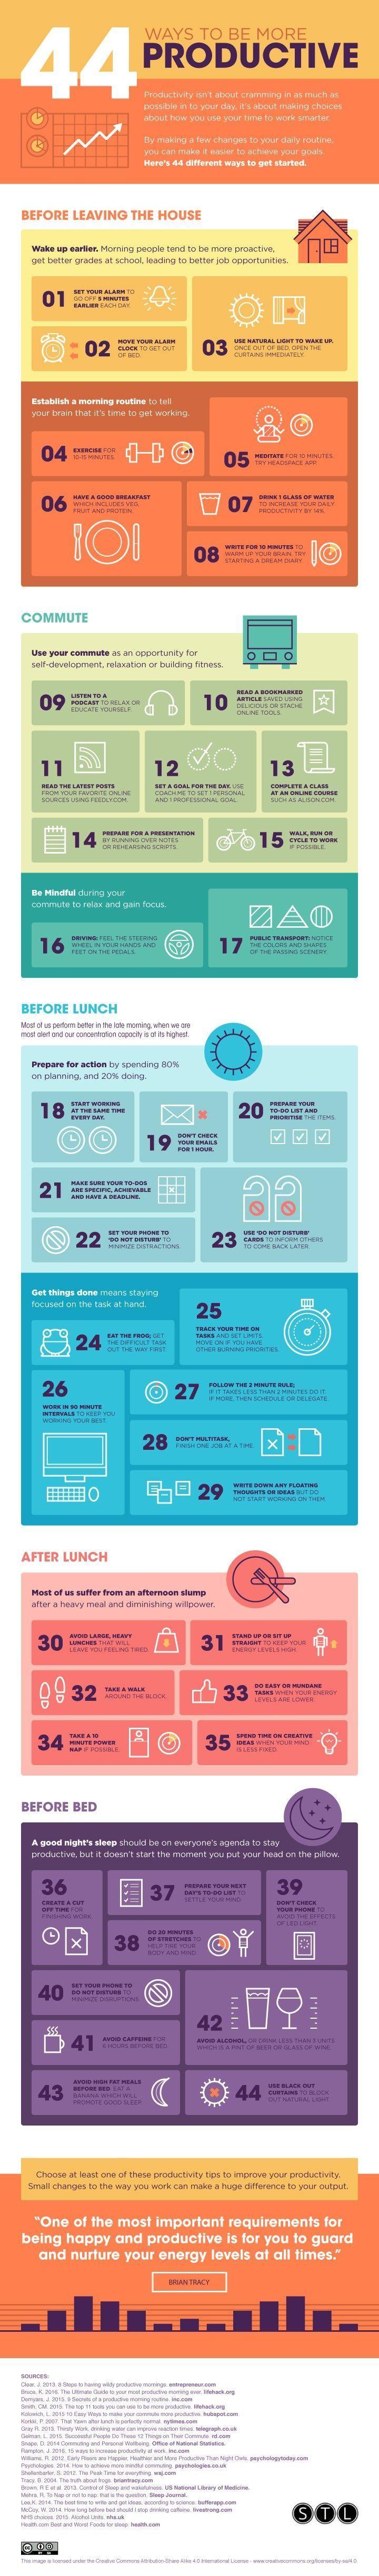 produktiver arbeiten tipps infografik